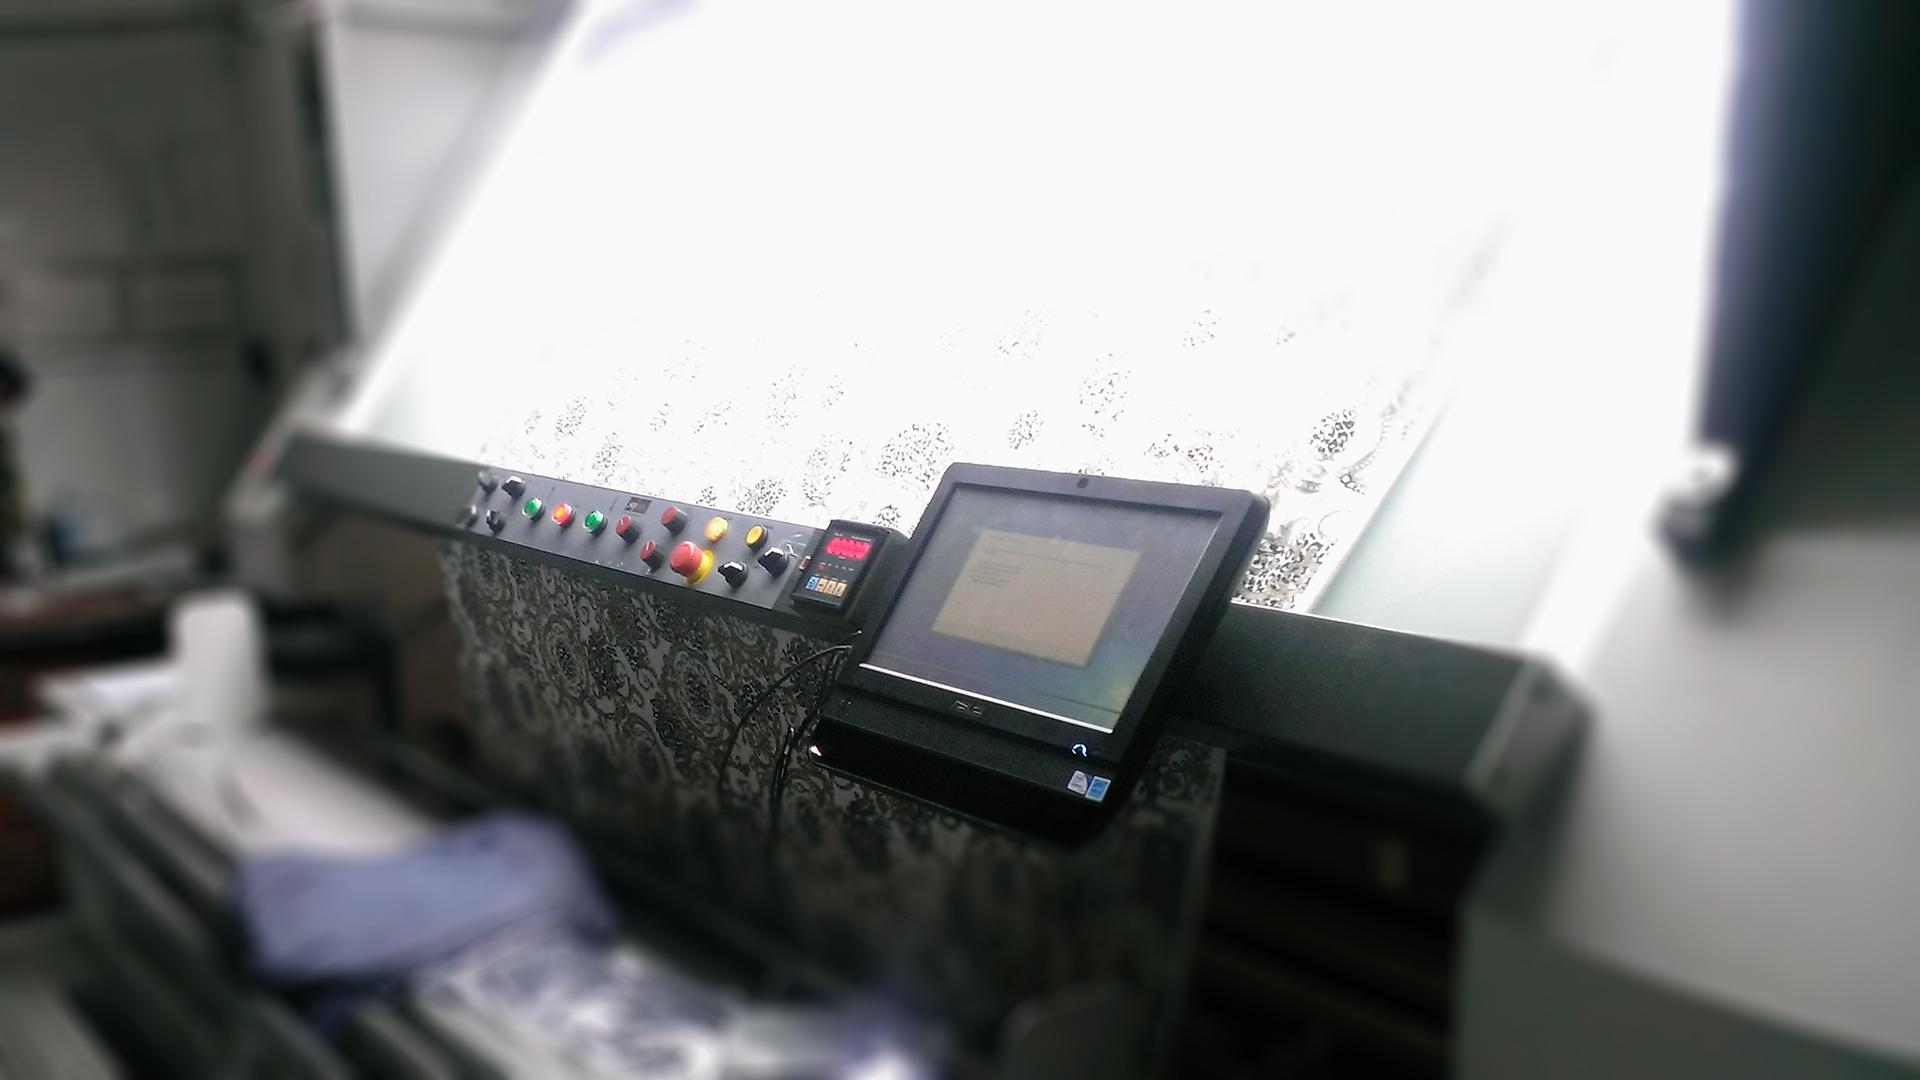 SmartPlus Kumaş Kontrol ve Laboratuvar Yonetimi Sistemi Makine